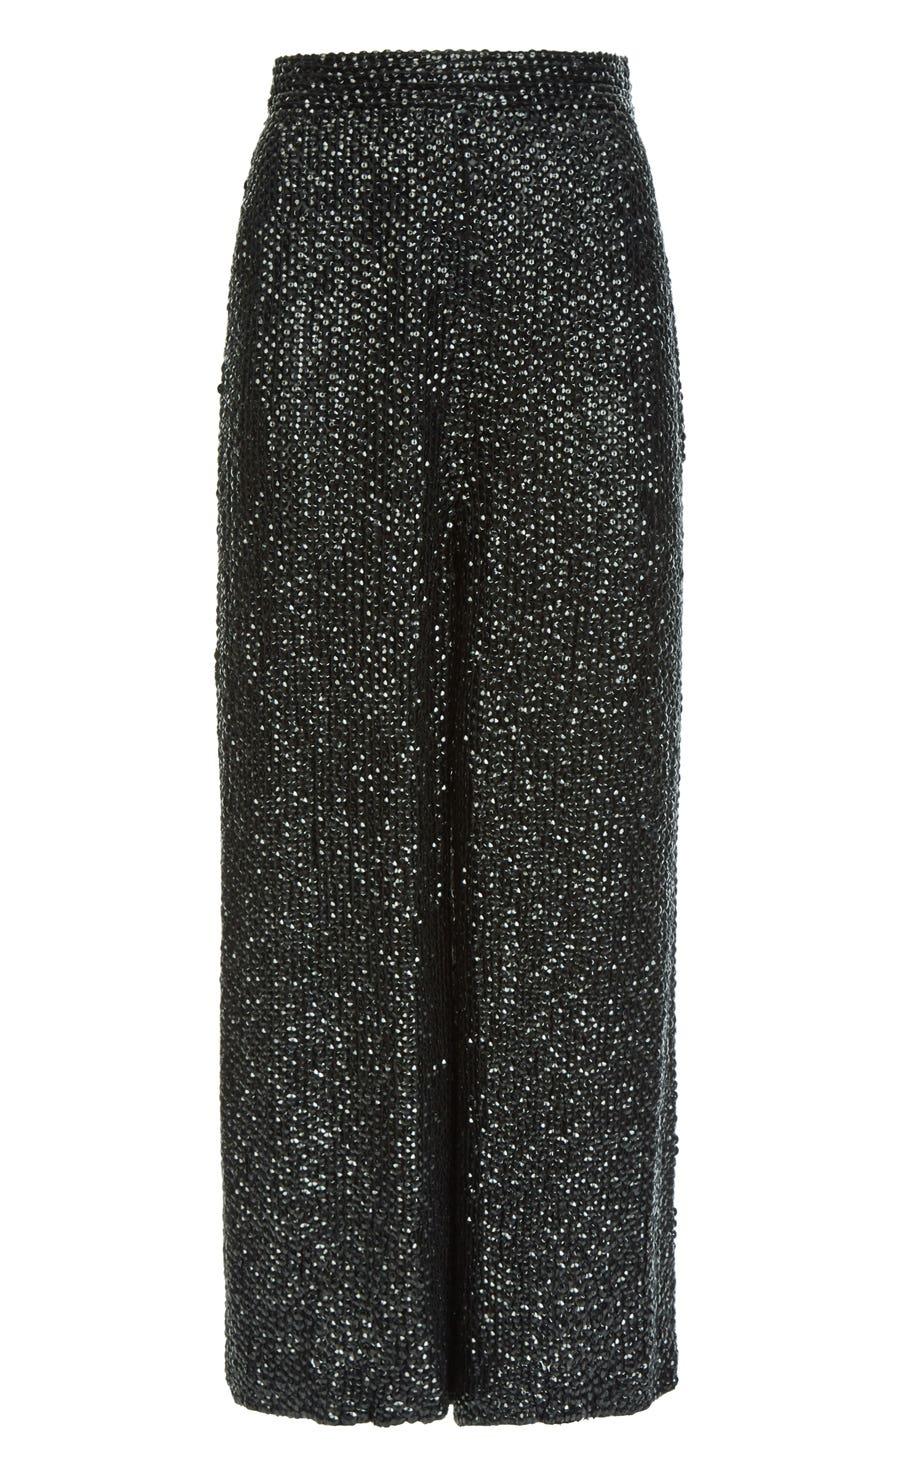 Tiara Trousers, Black